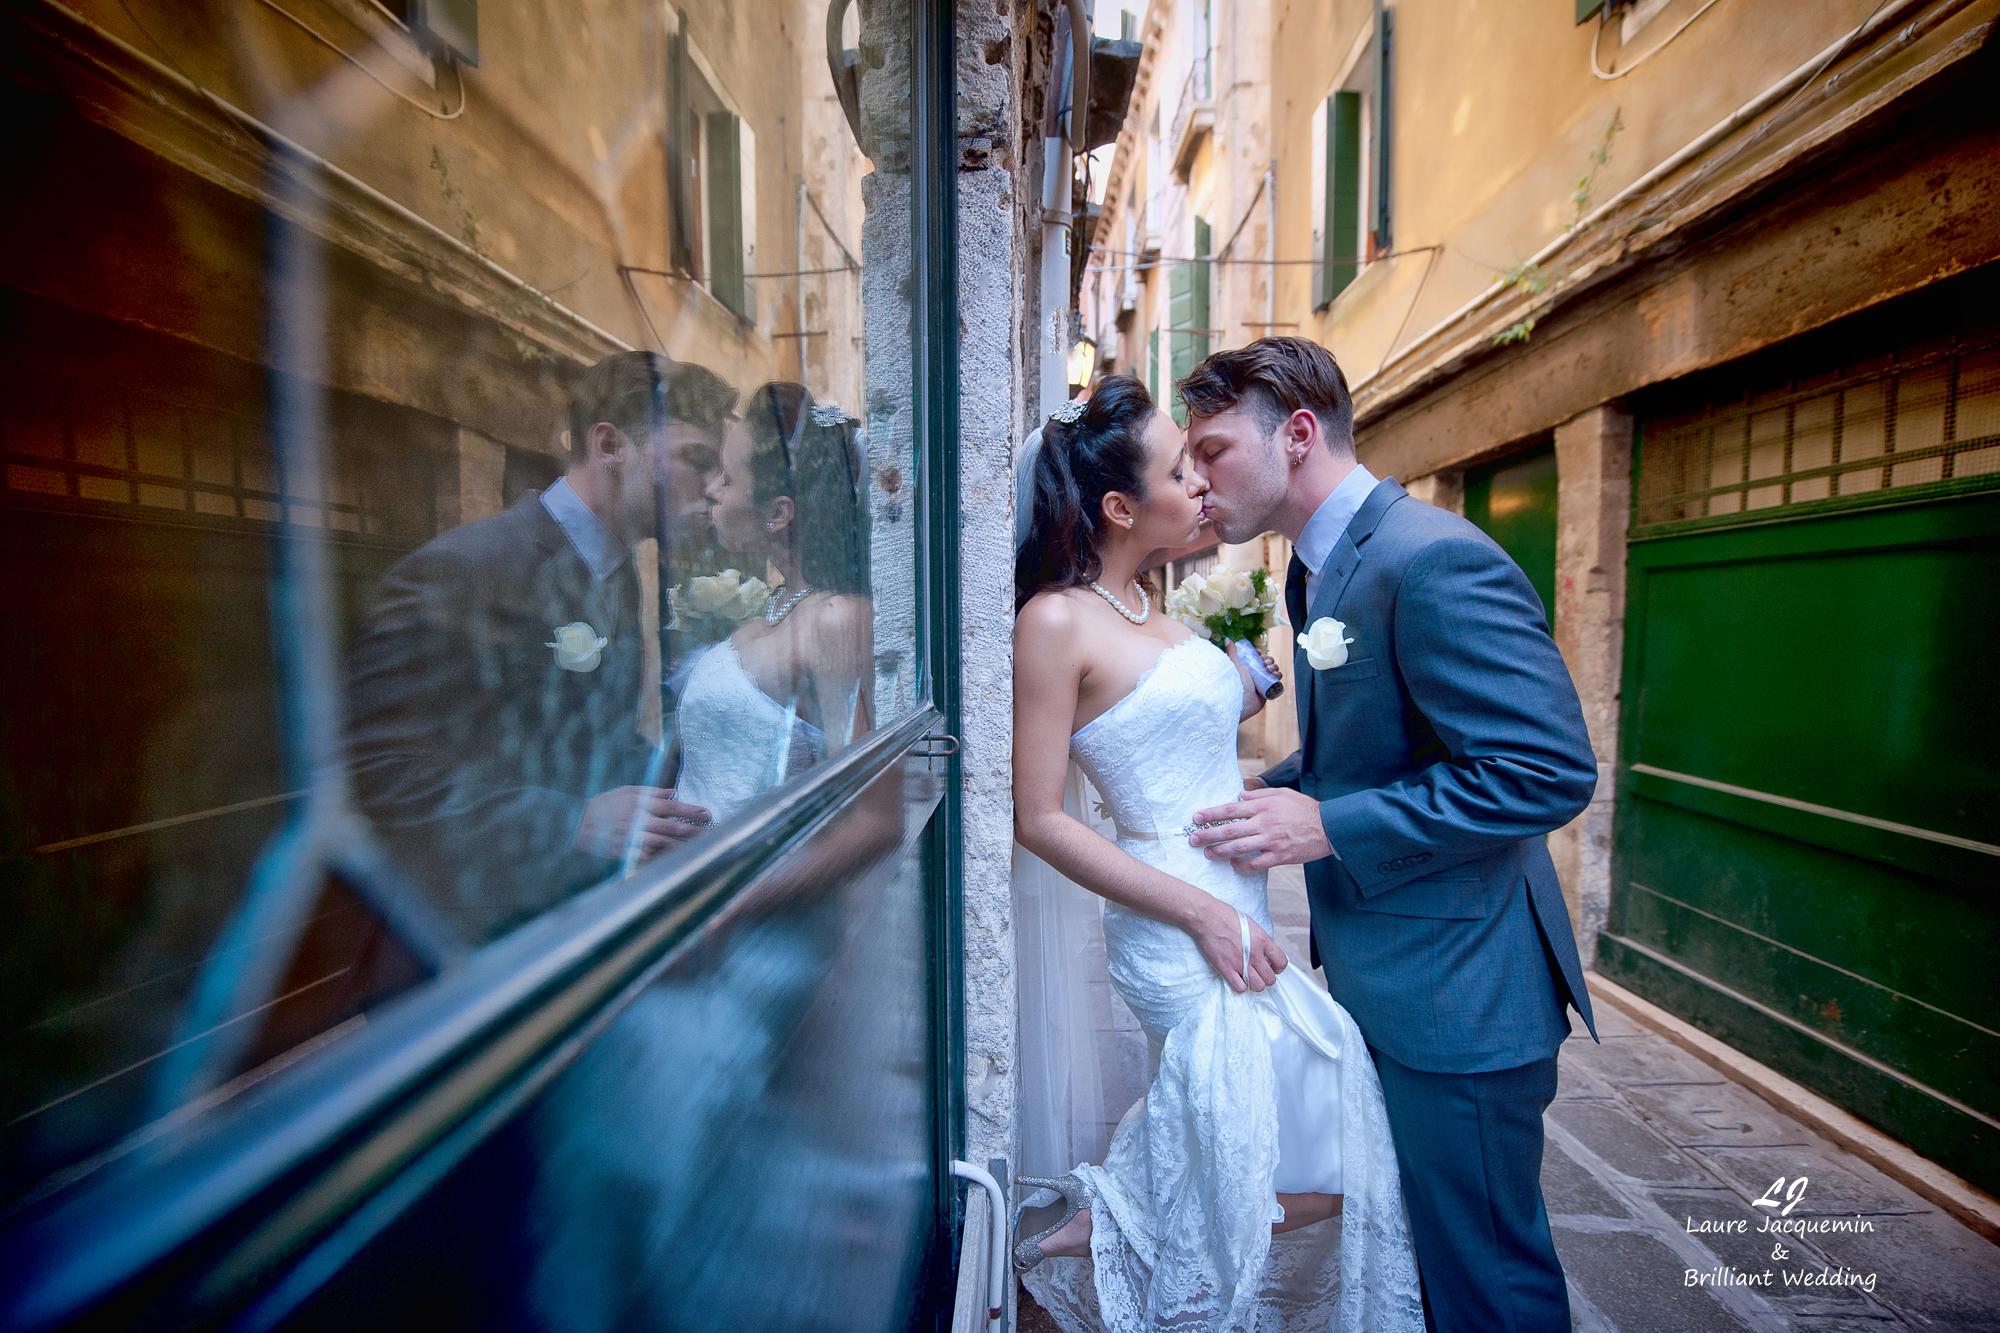 Venice Simbolic Wedding gondola venice Italy laure jacquemin photography (16) copia